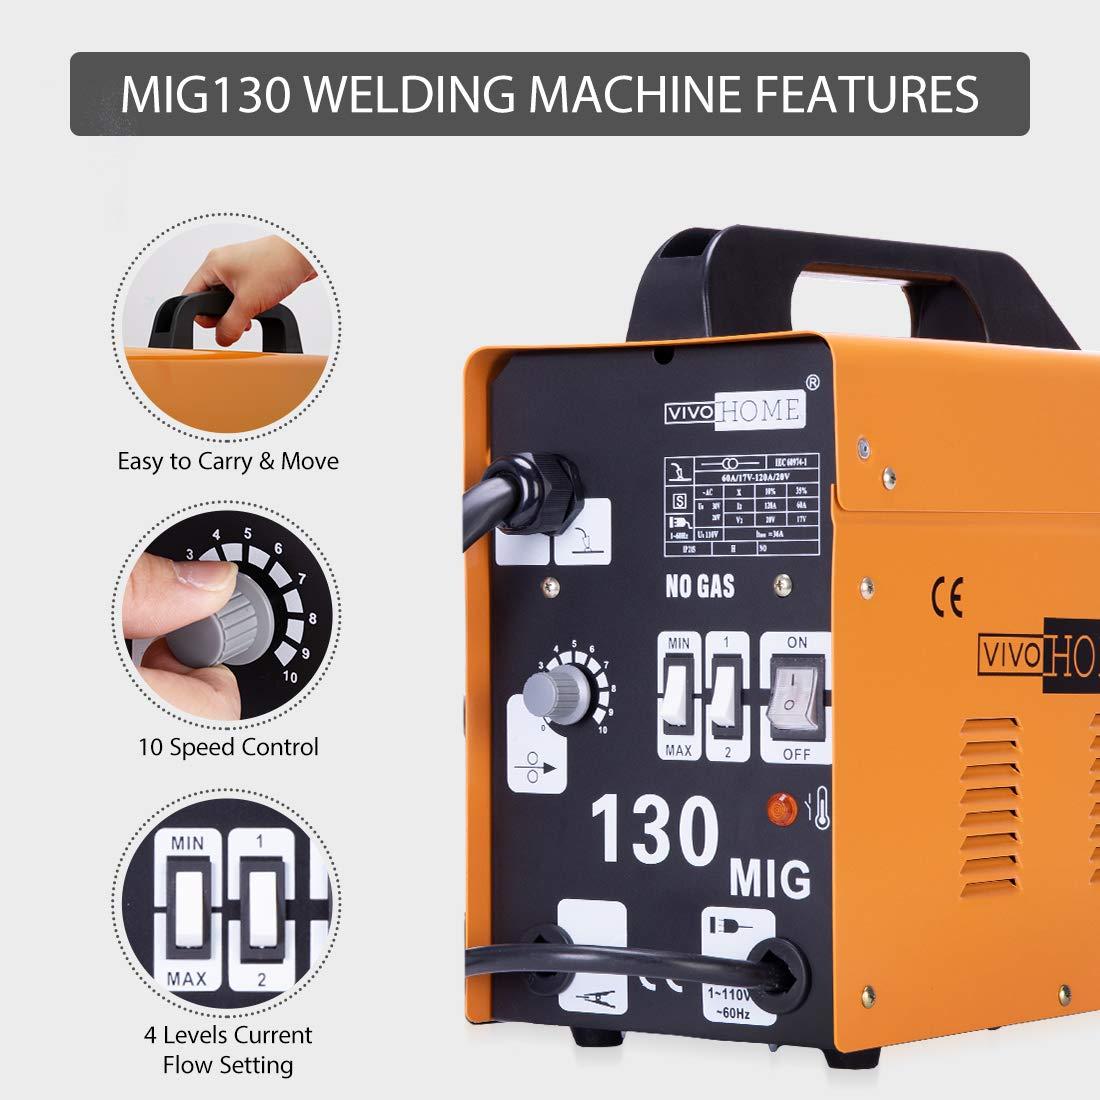 VIVOHOME Portable Flux Core Wire No Gas MIG 130 Welder Machine 110V by VIVOHOME (Image #3)